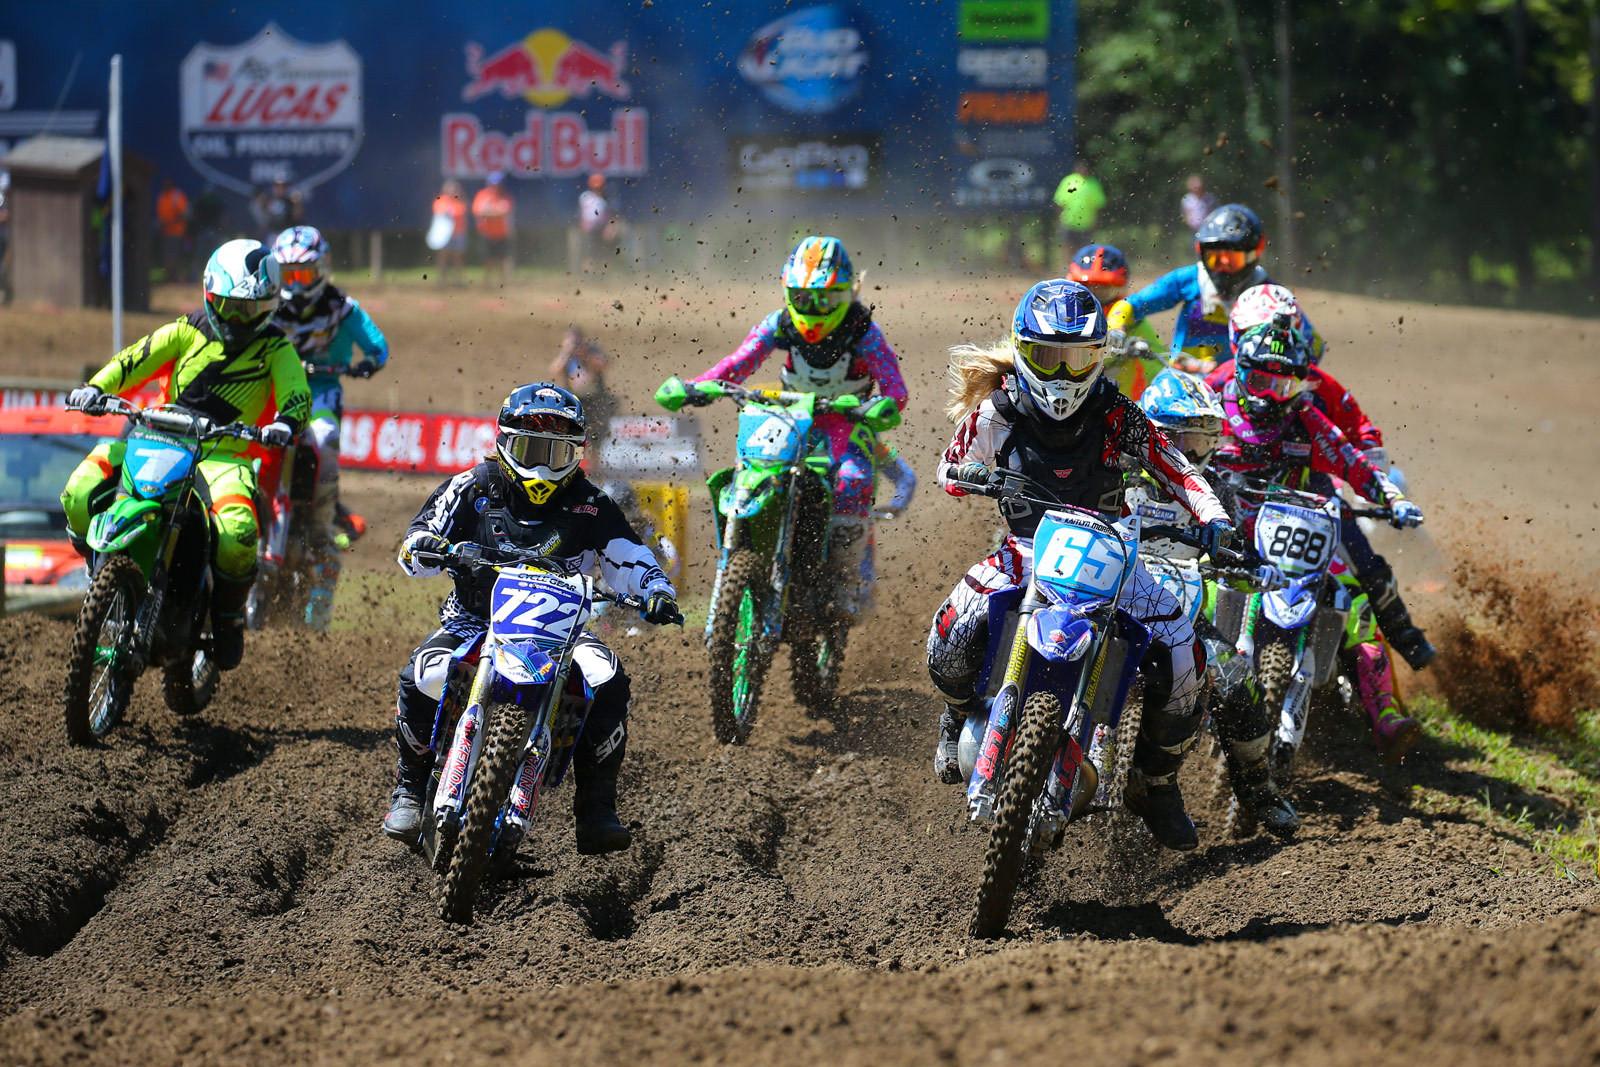 WMX - Vital MX Pit Bits: Ironman MX - Motocross Pictures - Vital MX